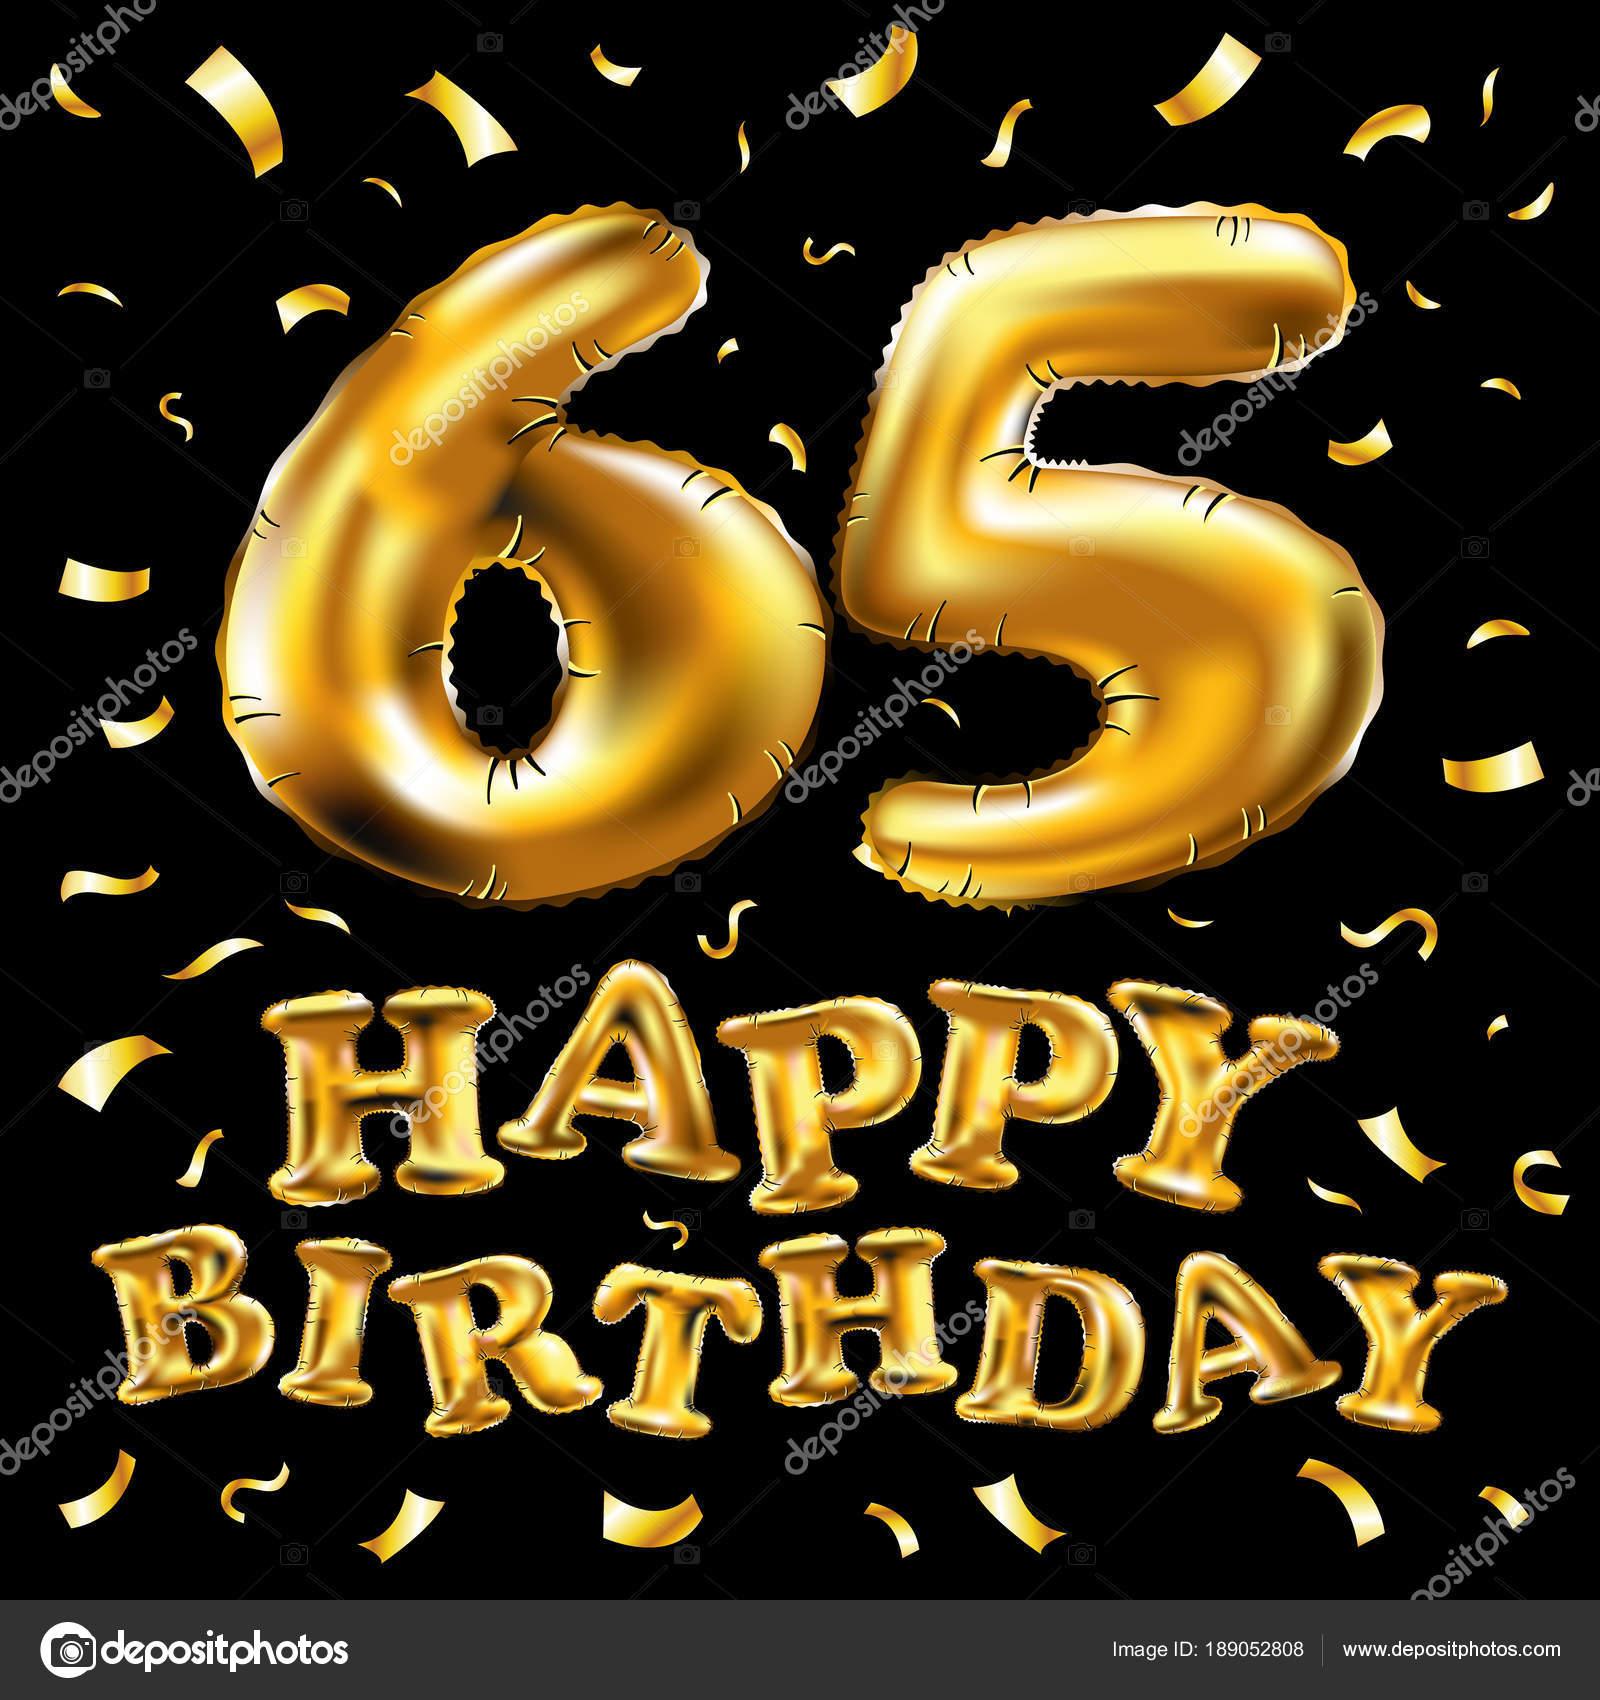 Vektor Alles Gute Zum Geburtstag 65 Feier Gold Ballons